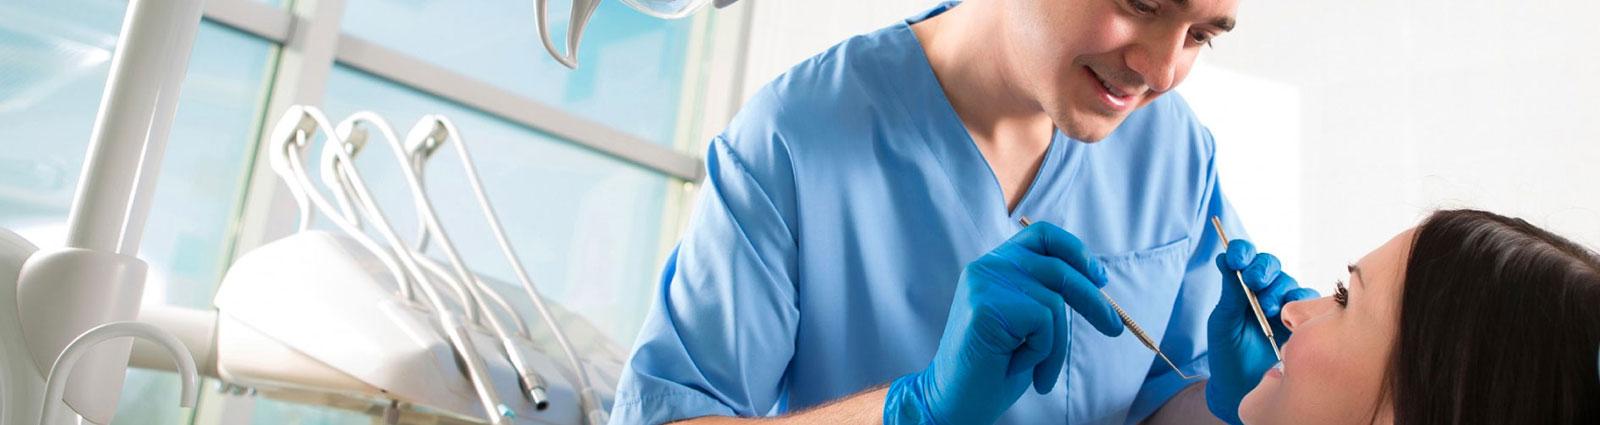 dental fillings by experienced dentist